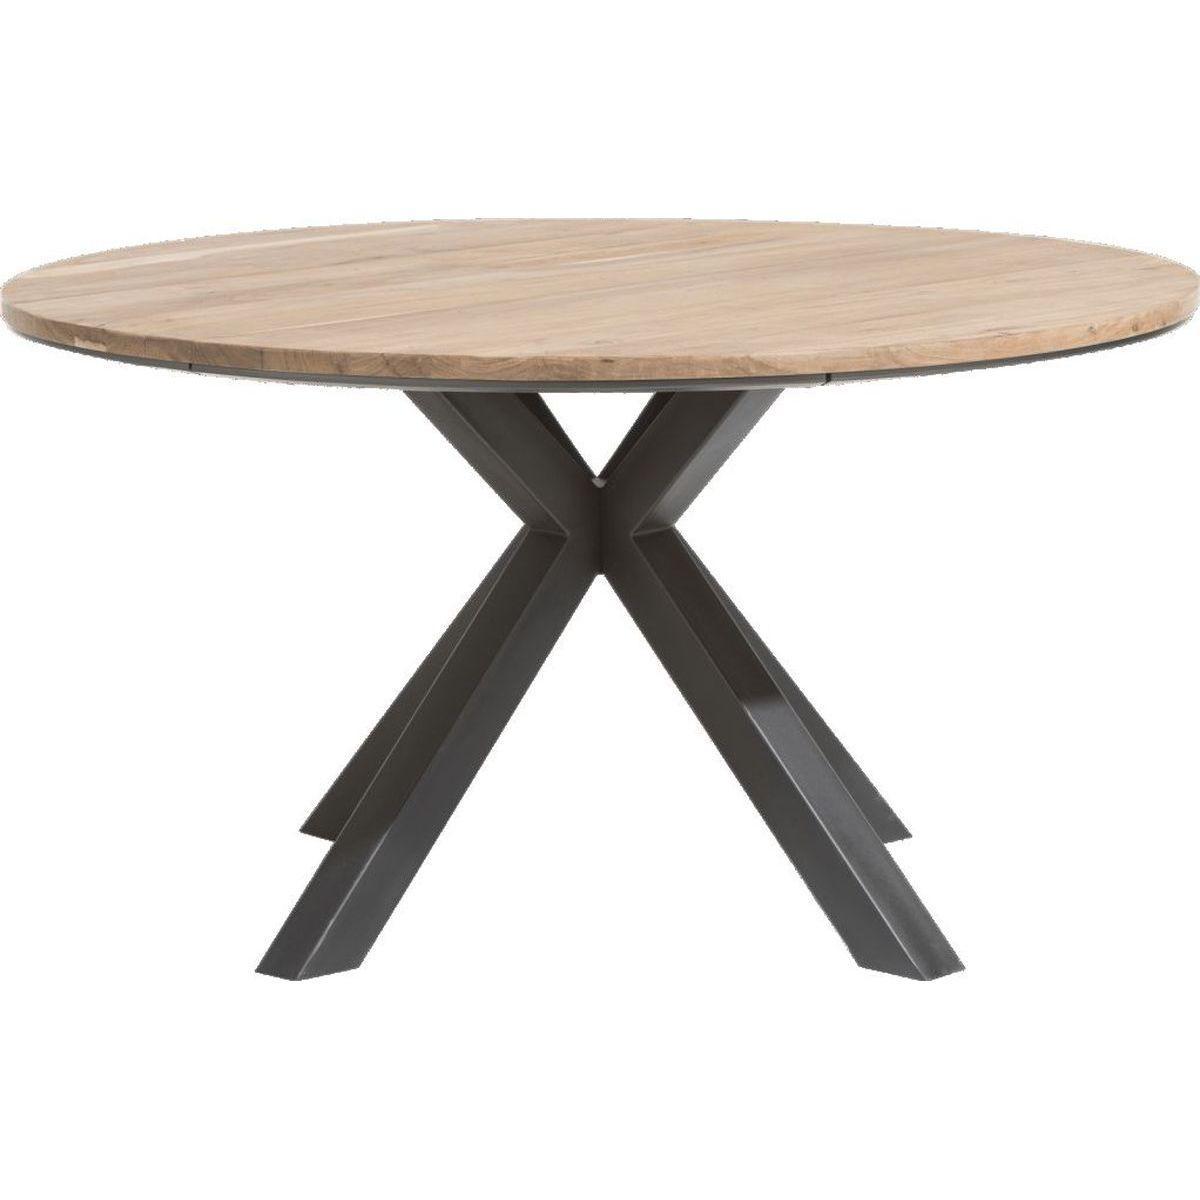 Table ronde COLOMBO Xooon Chêne railway brown 150cm